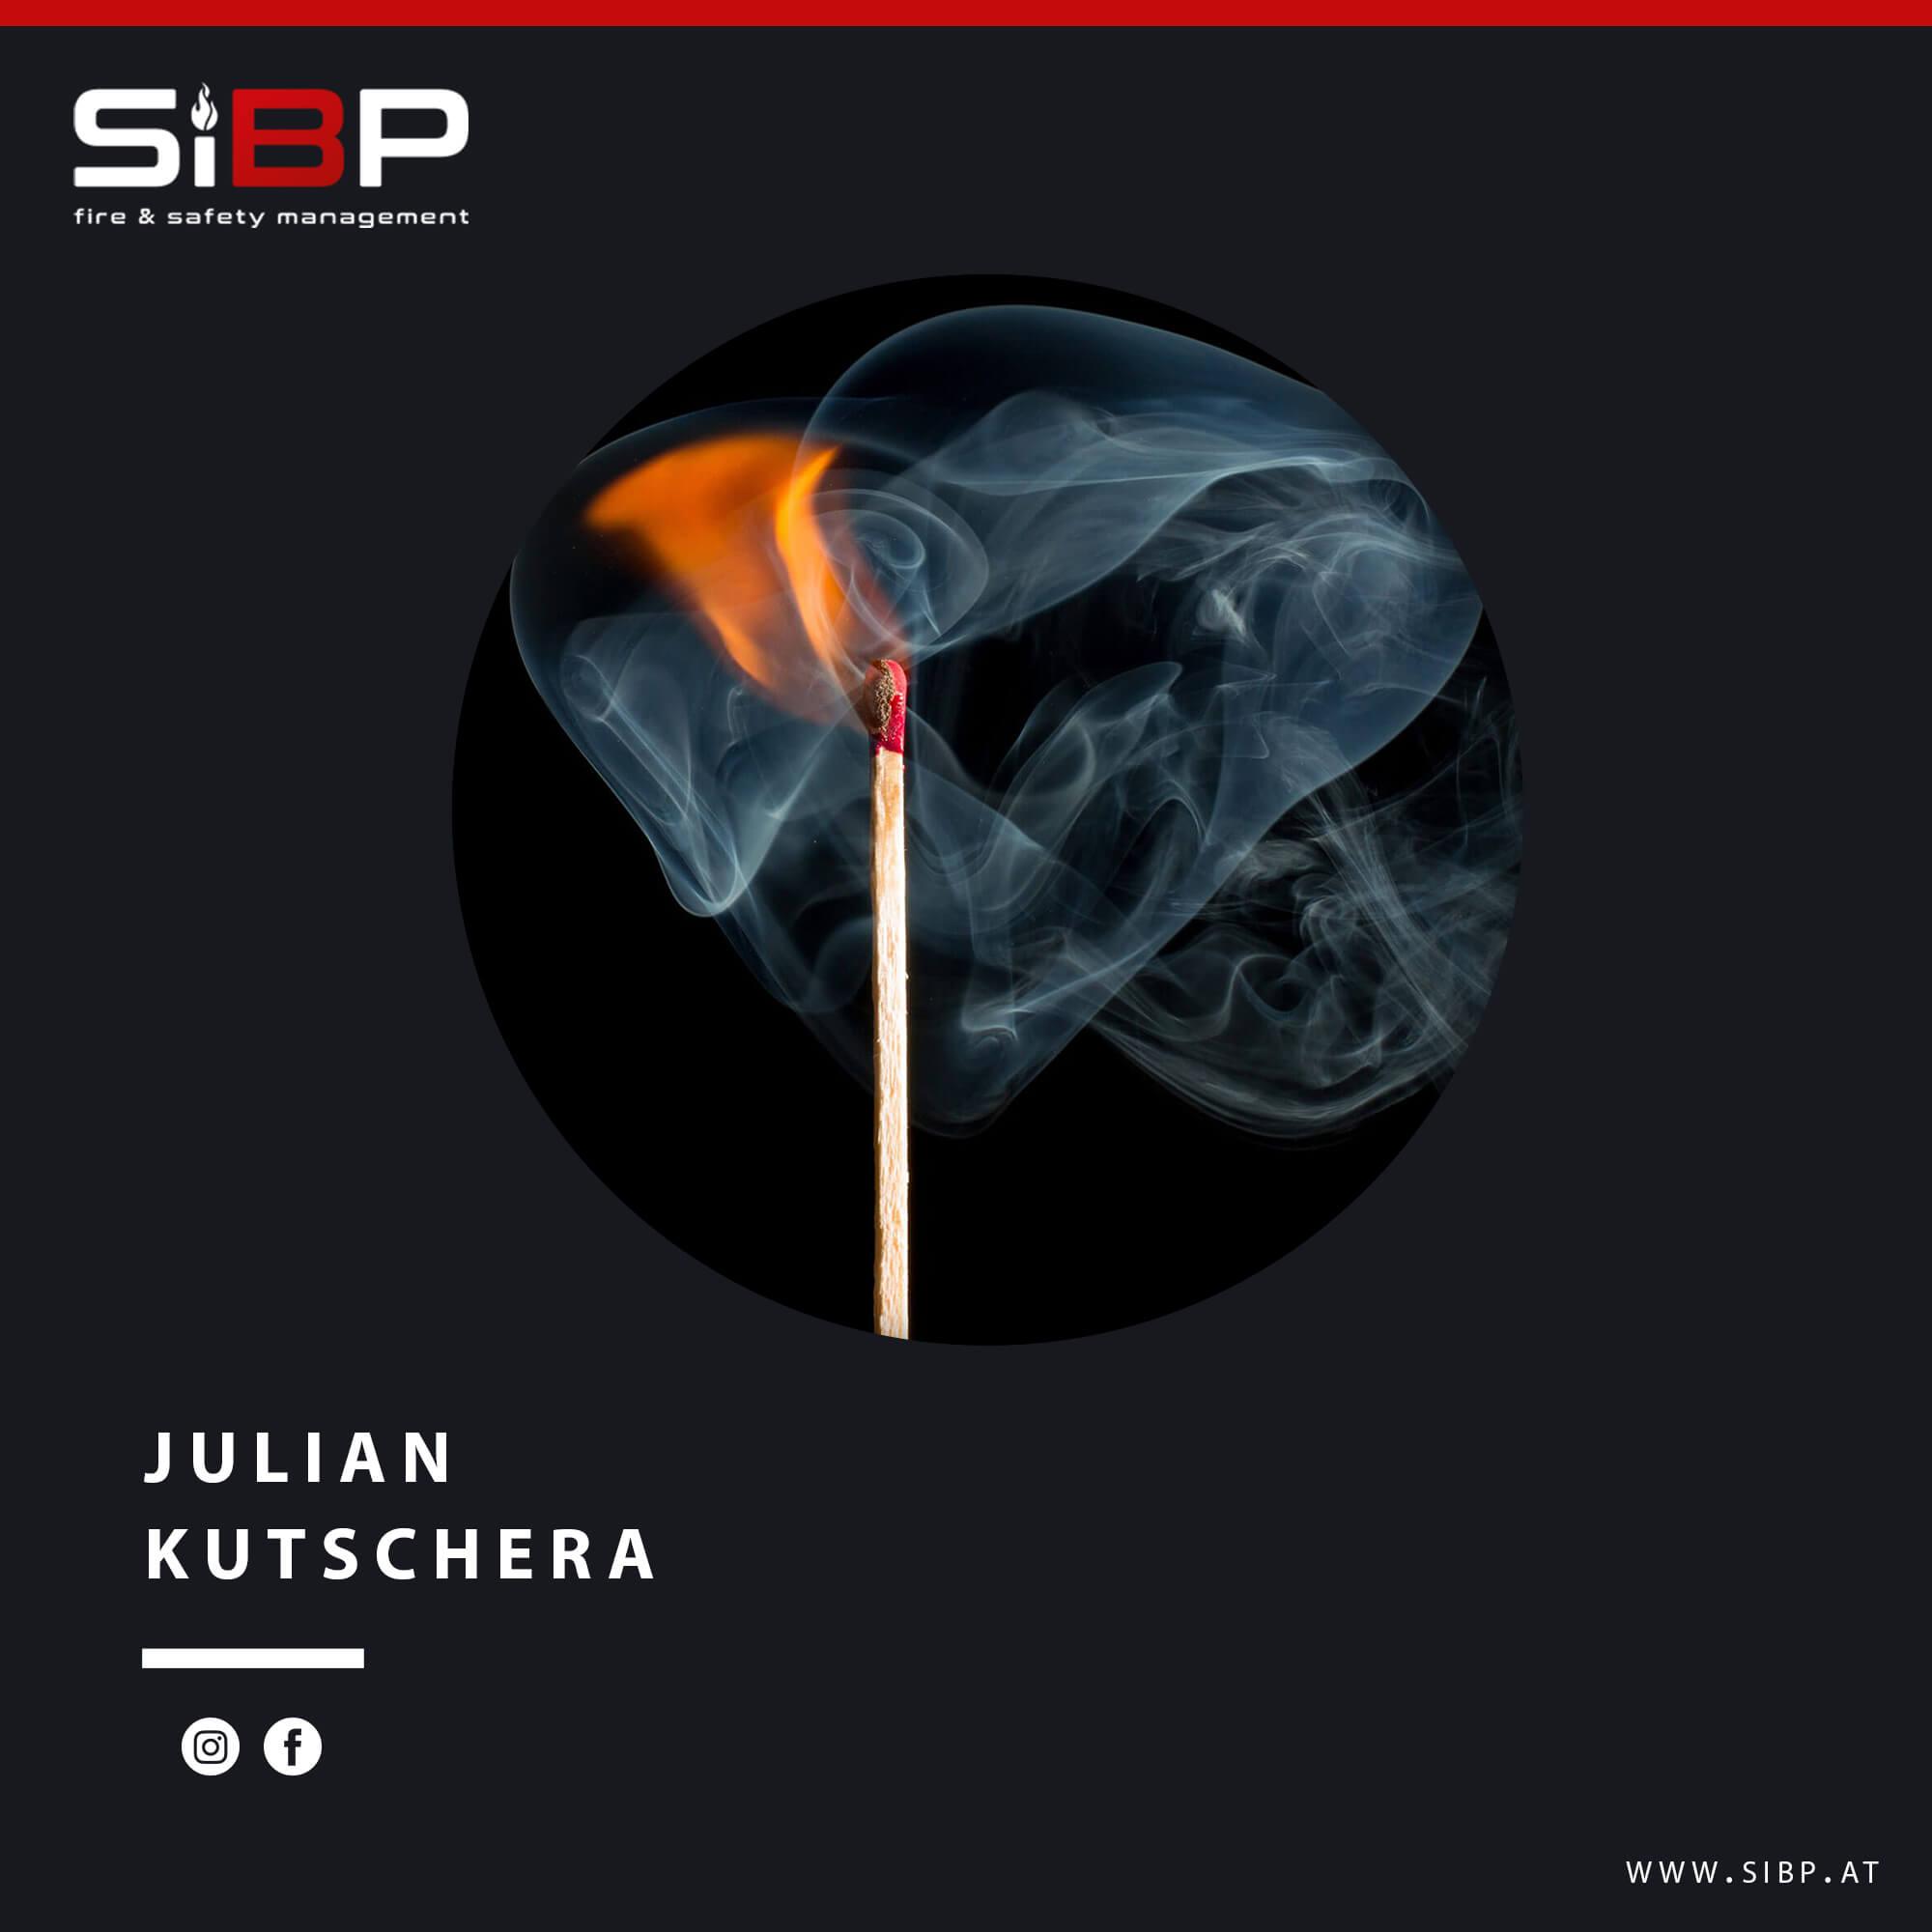 Julian-Kutschera-SiBP